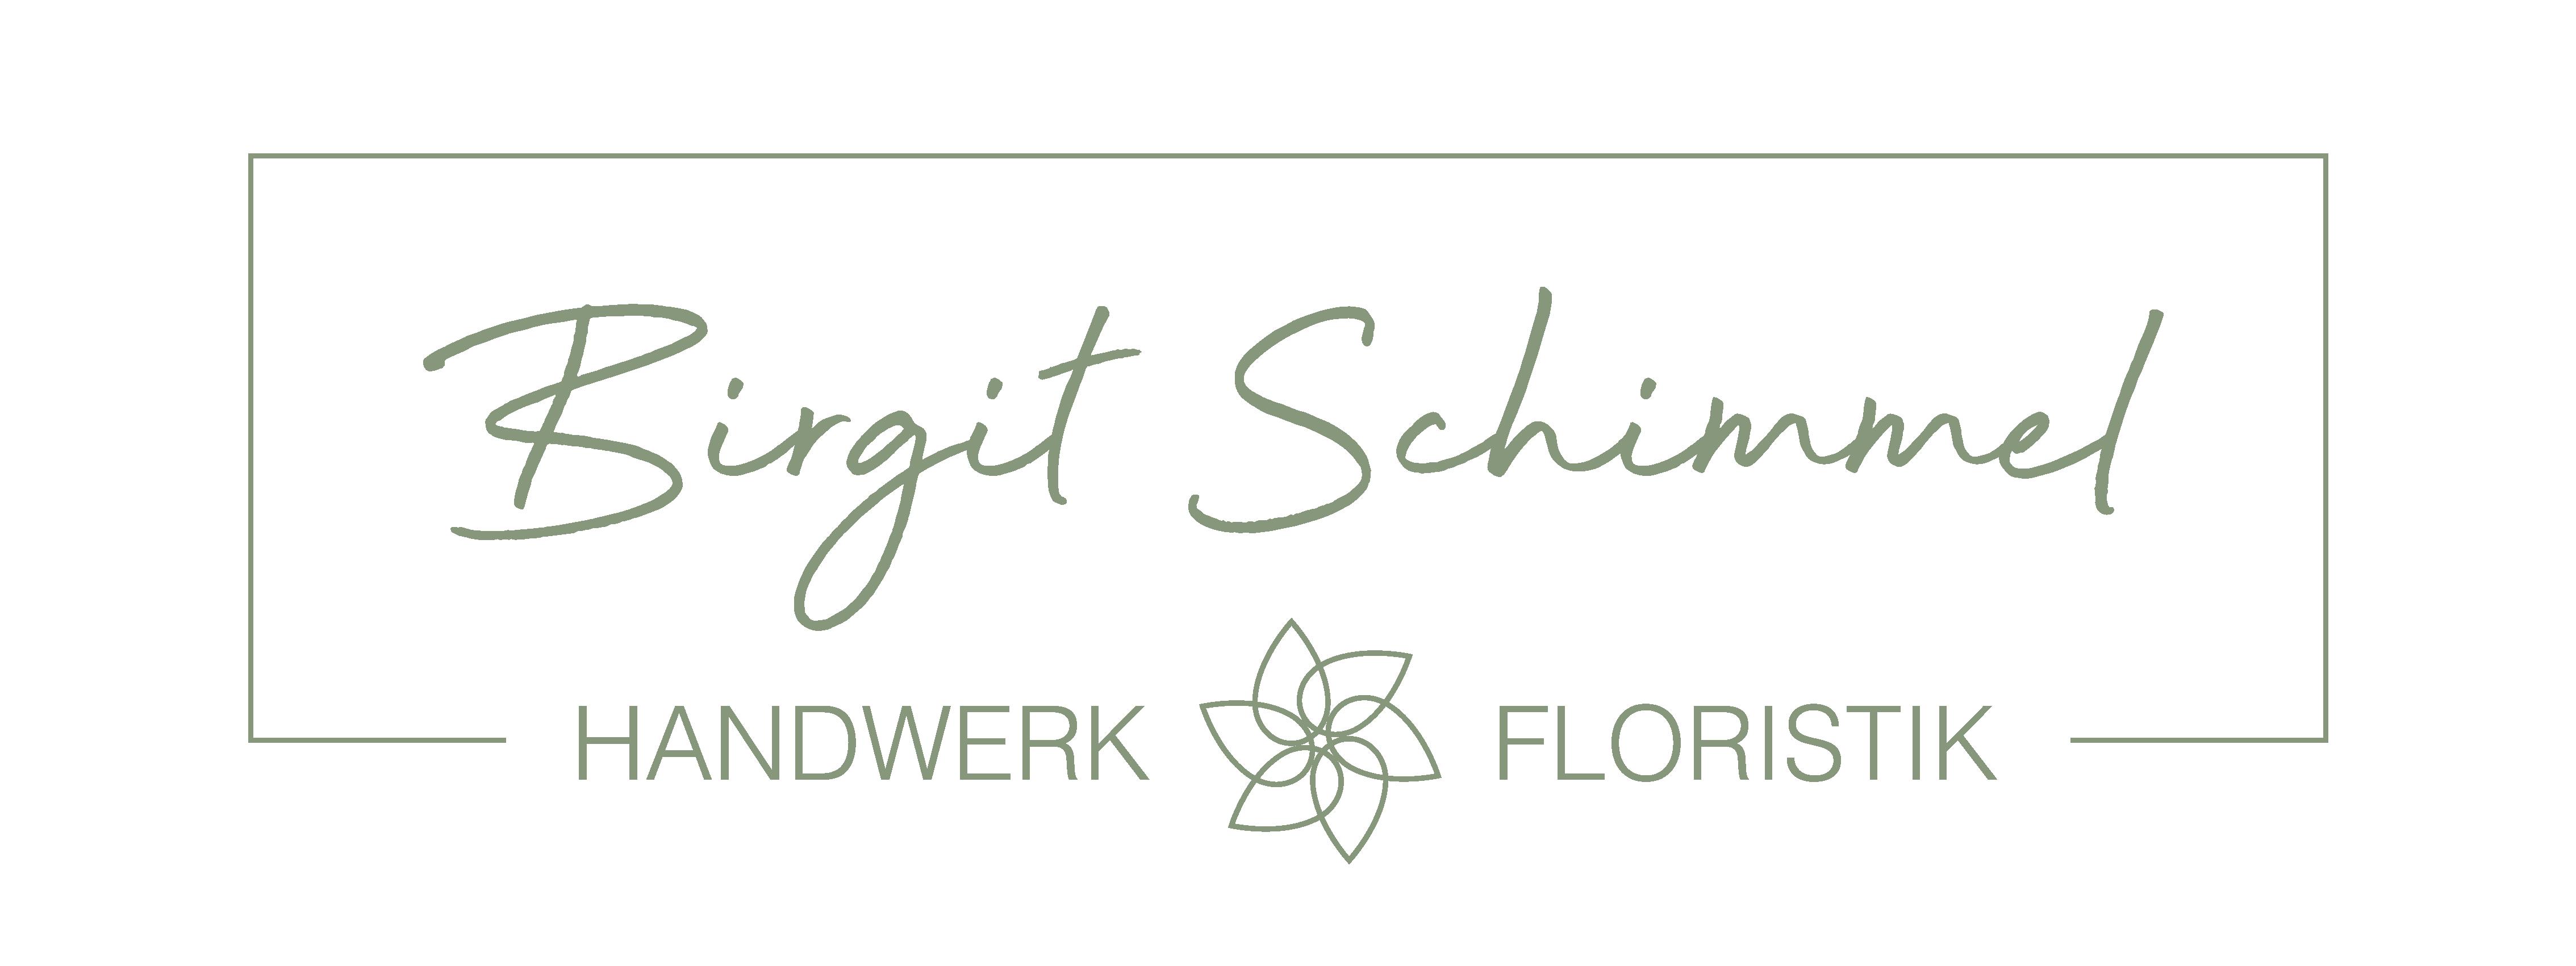 Birgit Schimmel